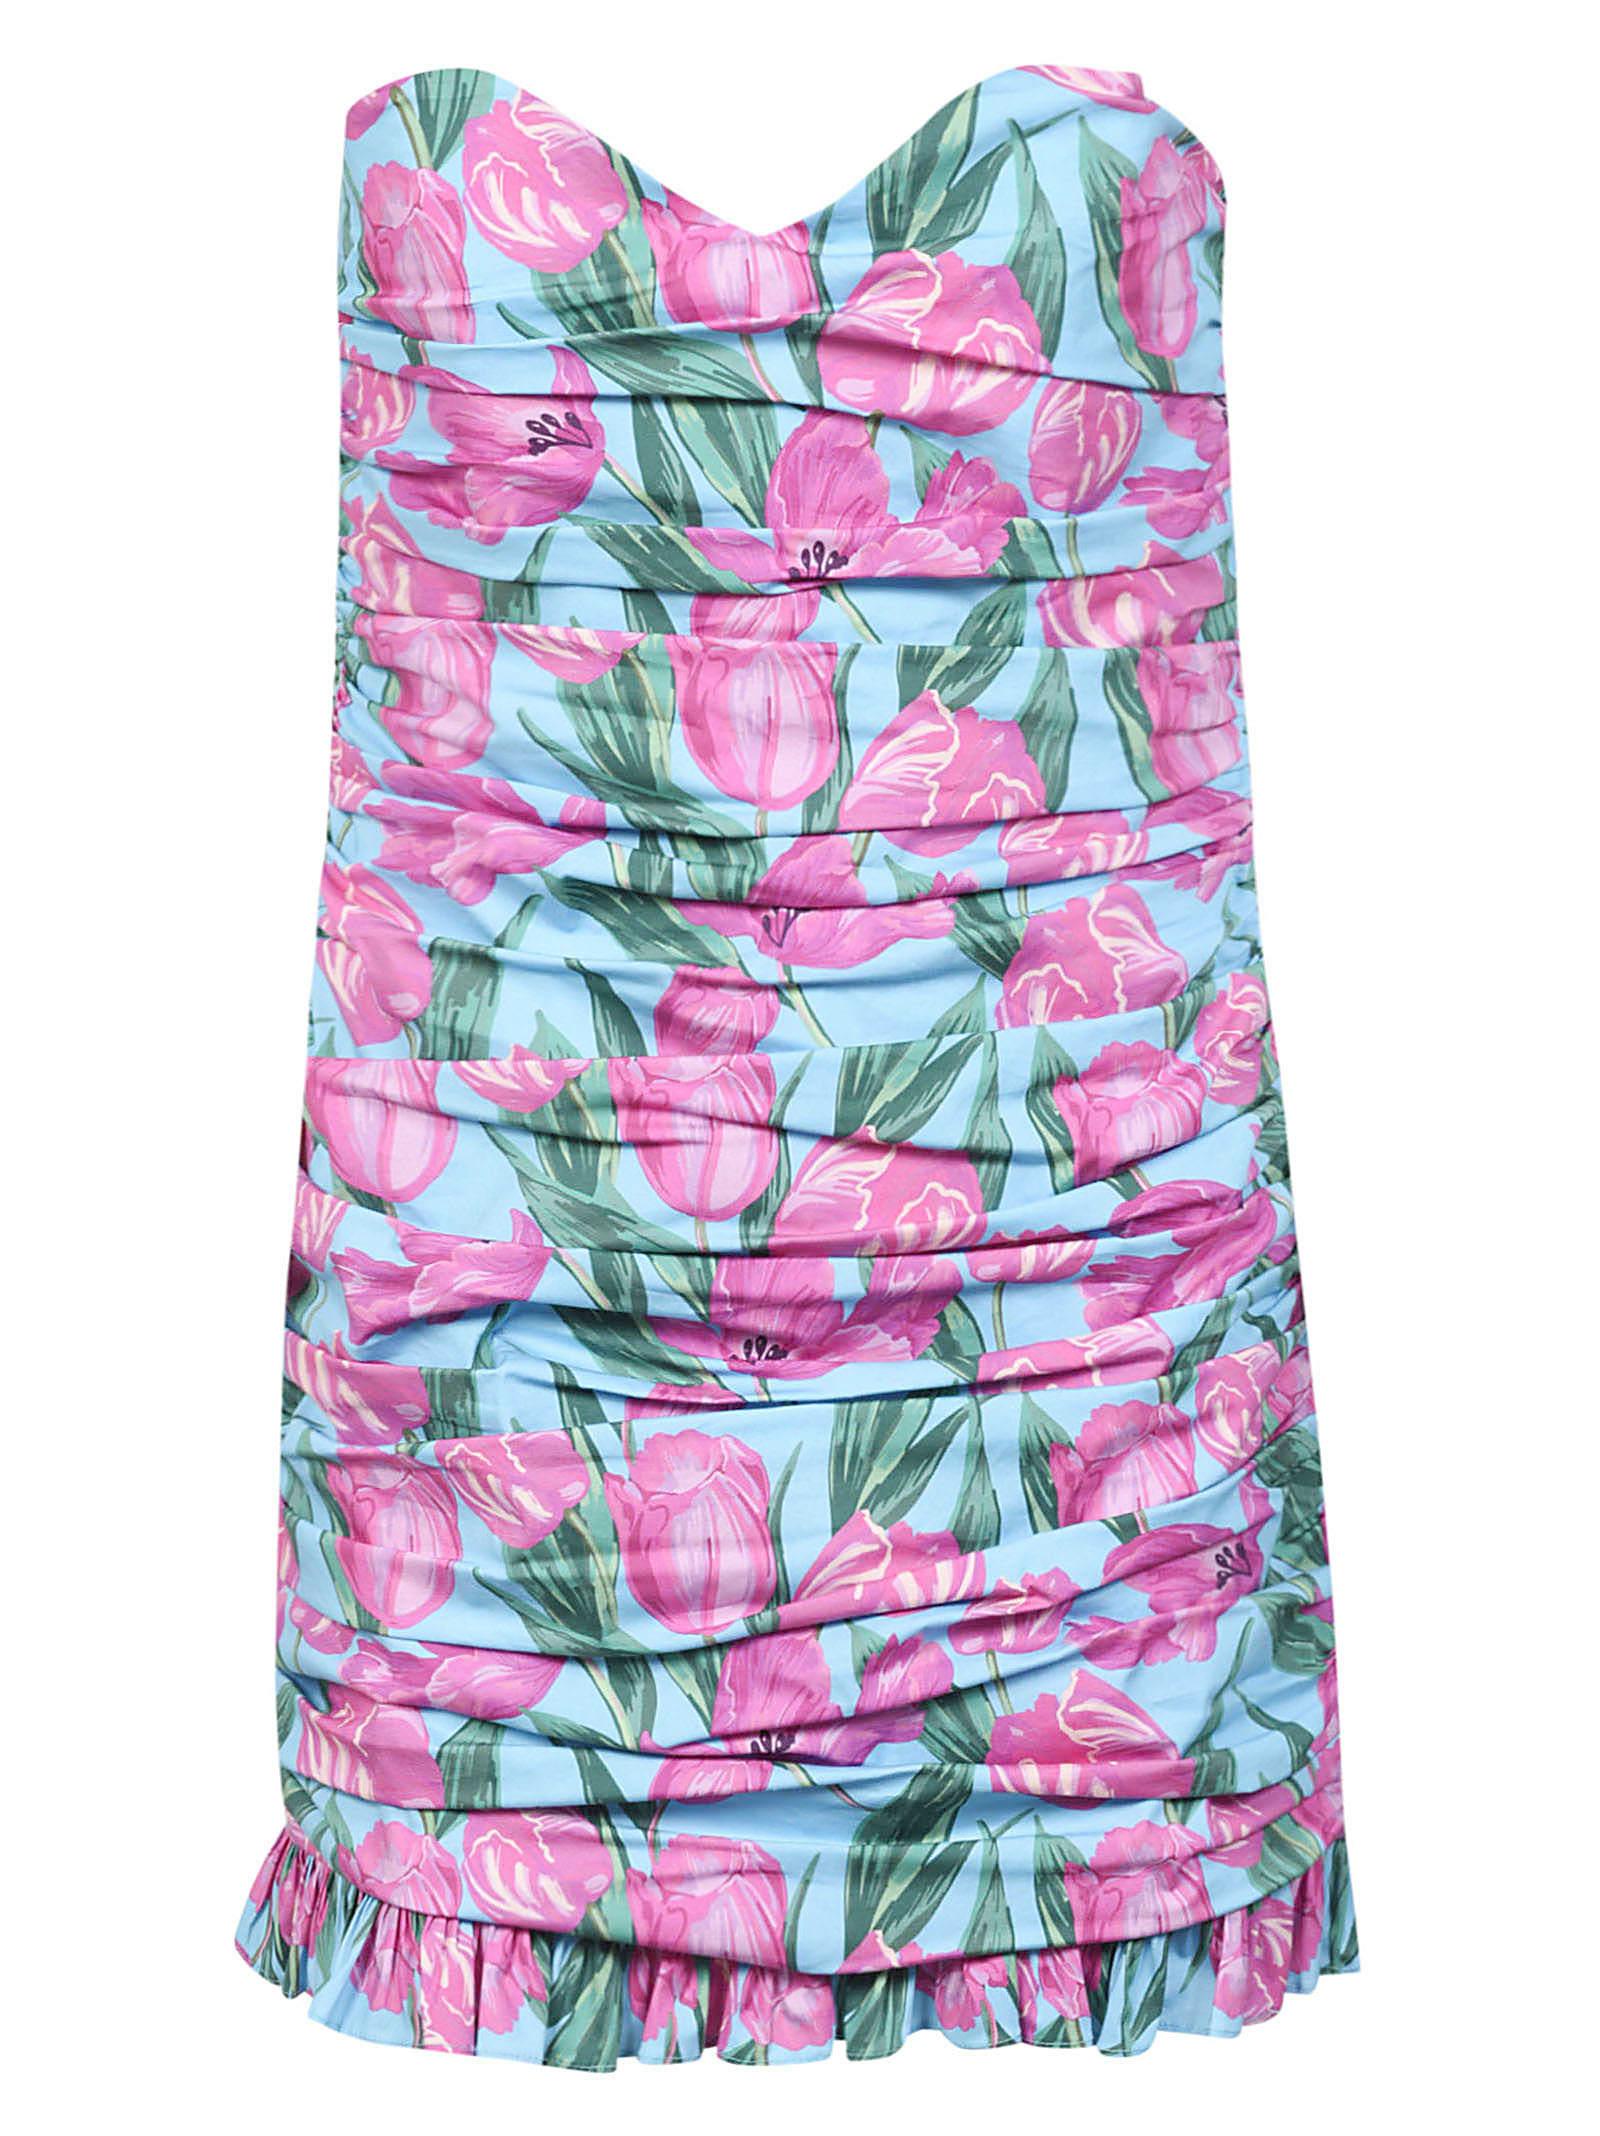 Buy Giuseppe di Morabito Rear Zip Floral Dress online, shop Giuseppe di Morabito with free shipping